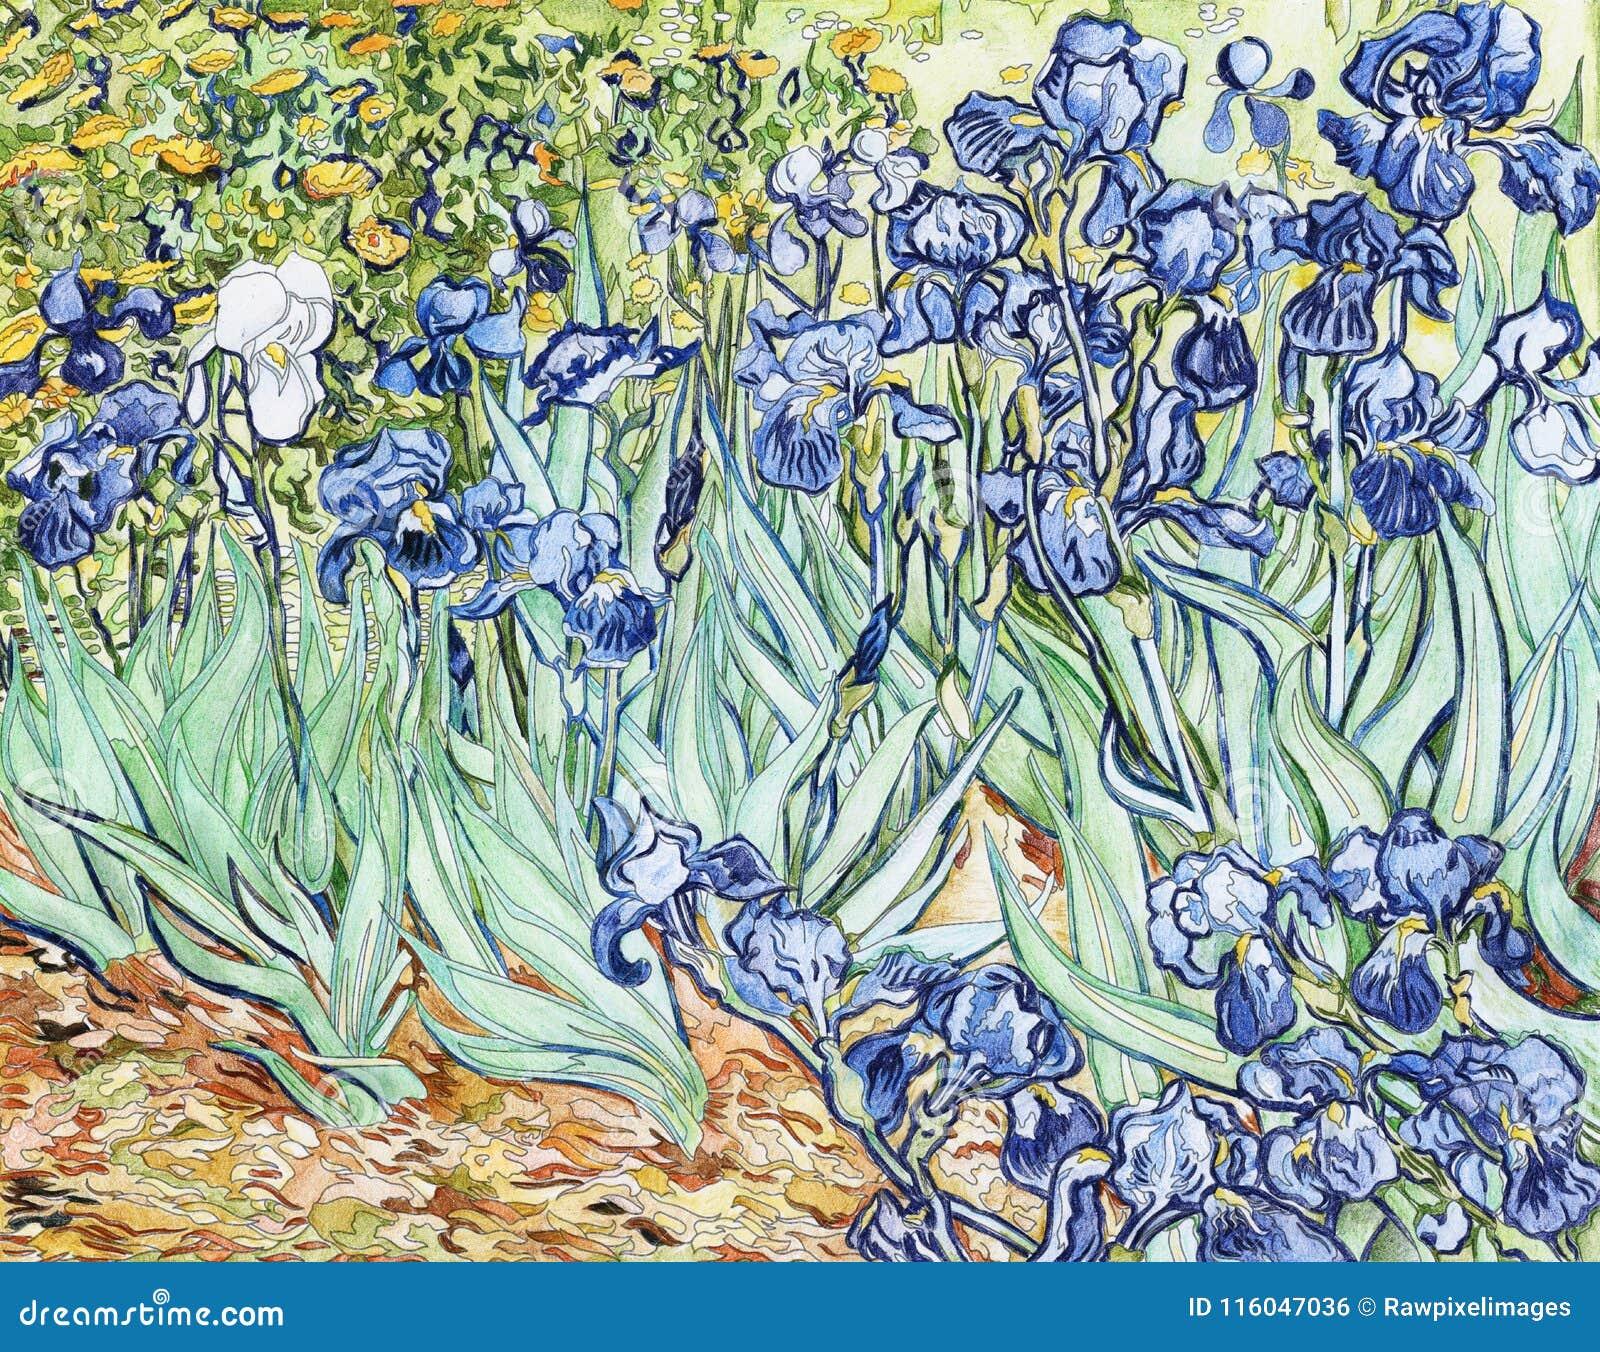 vincent van gogh lilies